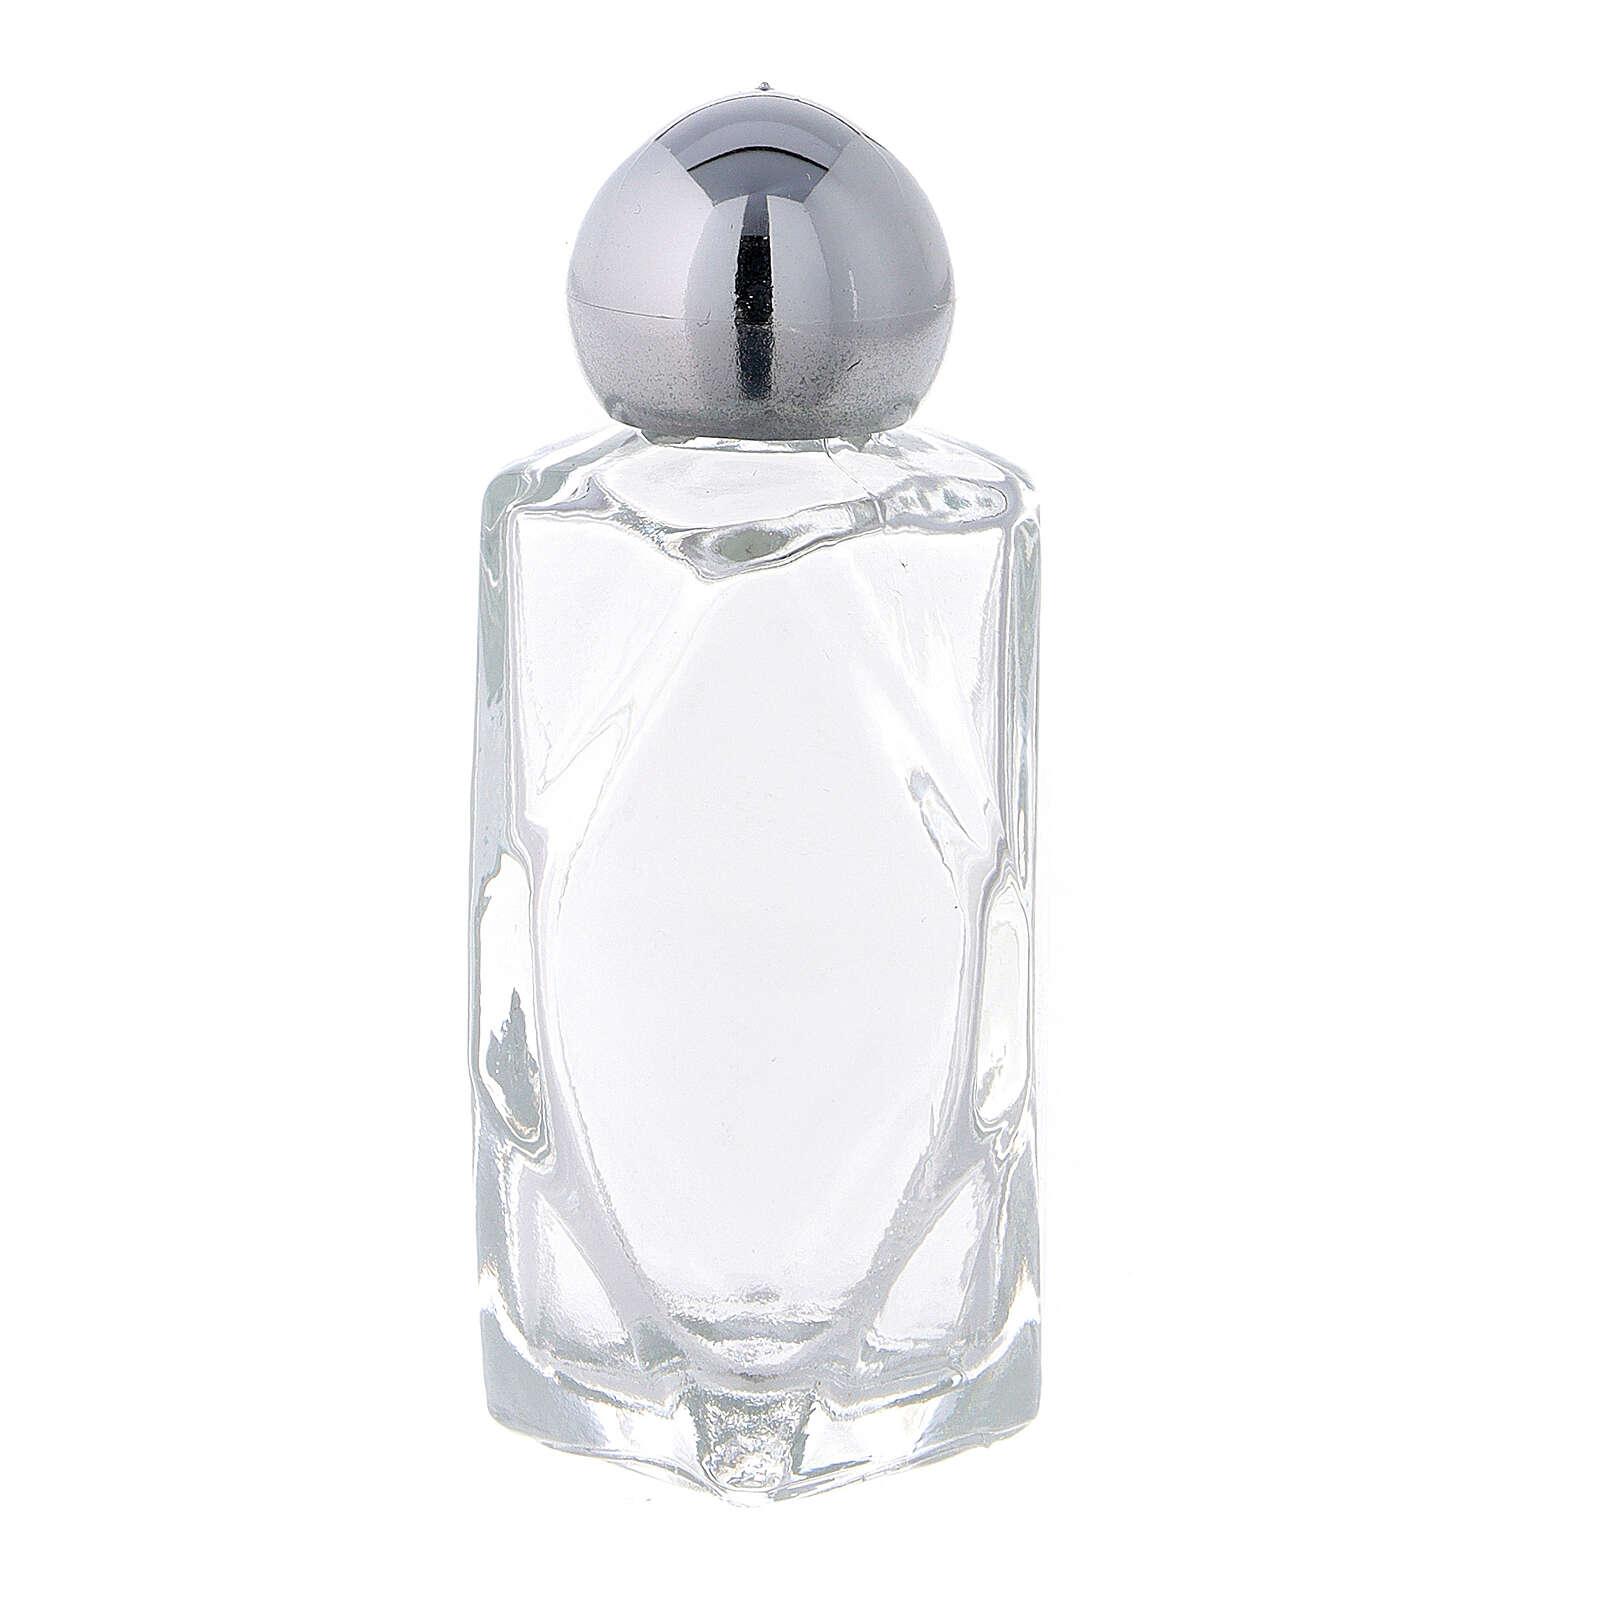 Botella para agua bendita vidrio 15 ml (CAJA 50 PIEZAS) 3